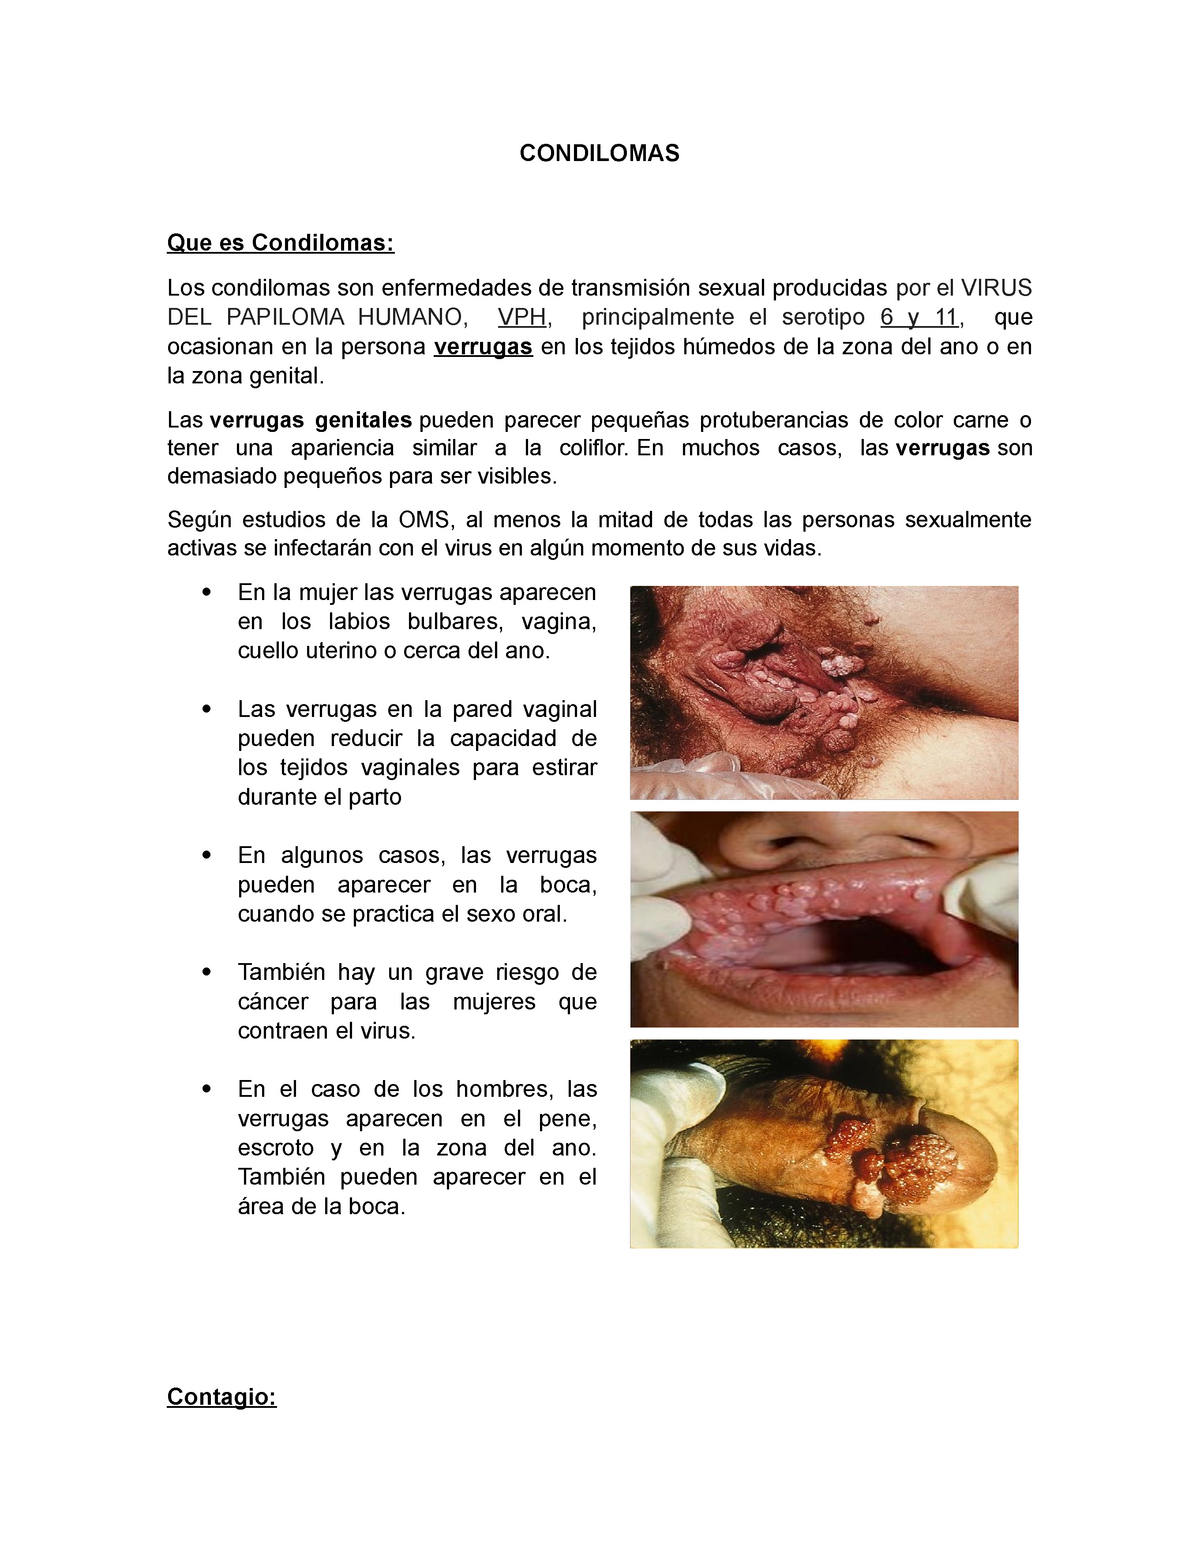 virus del papiloma en zona genital)